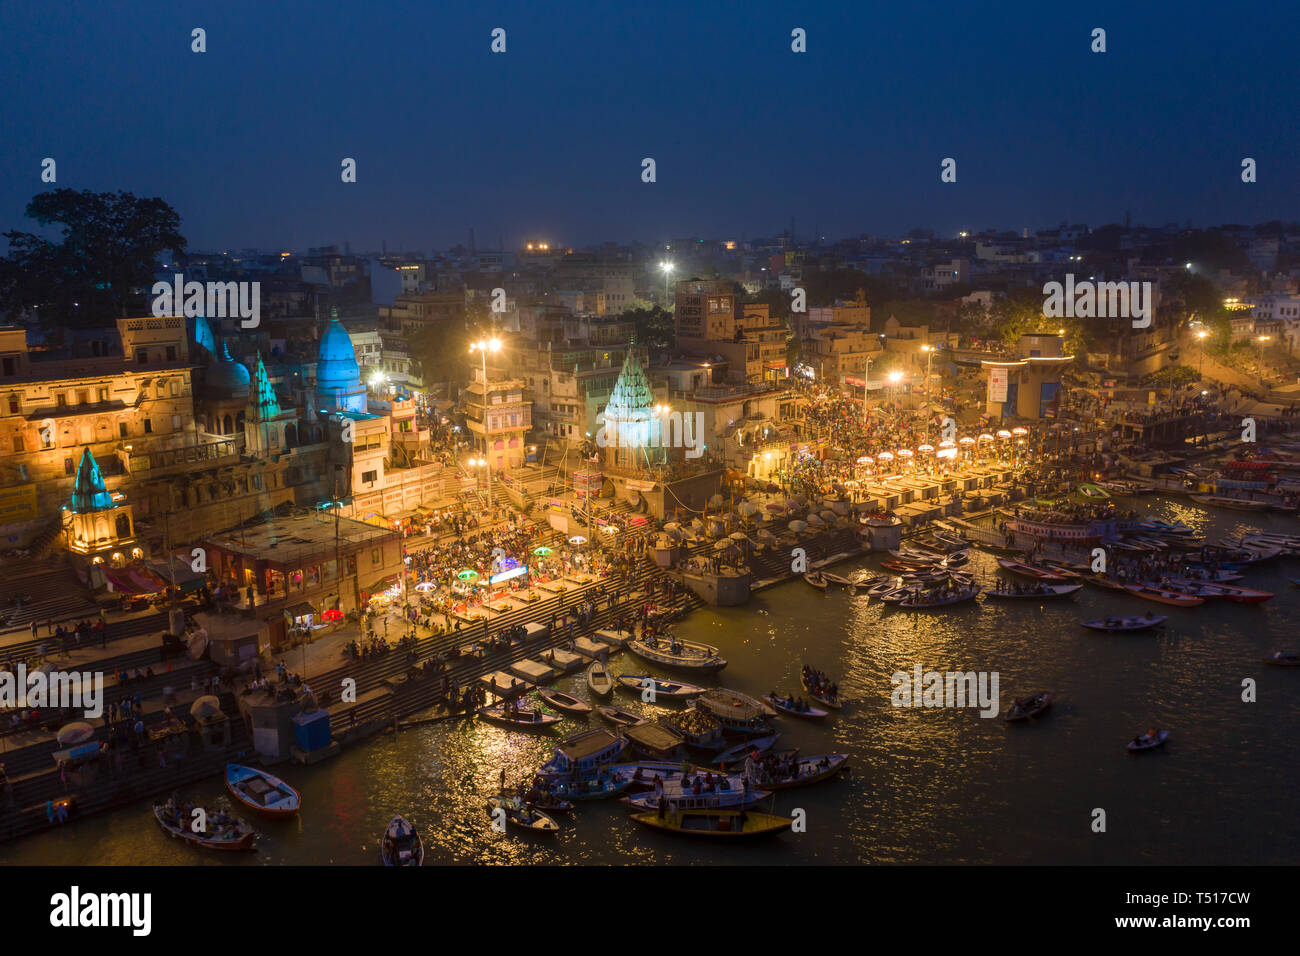 La India, Uttar Pradesh, Varanasi, Río Gange y Ghats histórico Imagen De Stock